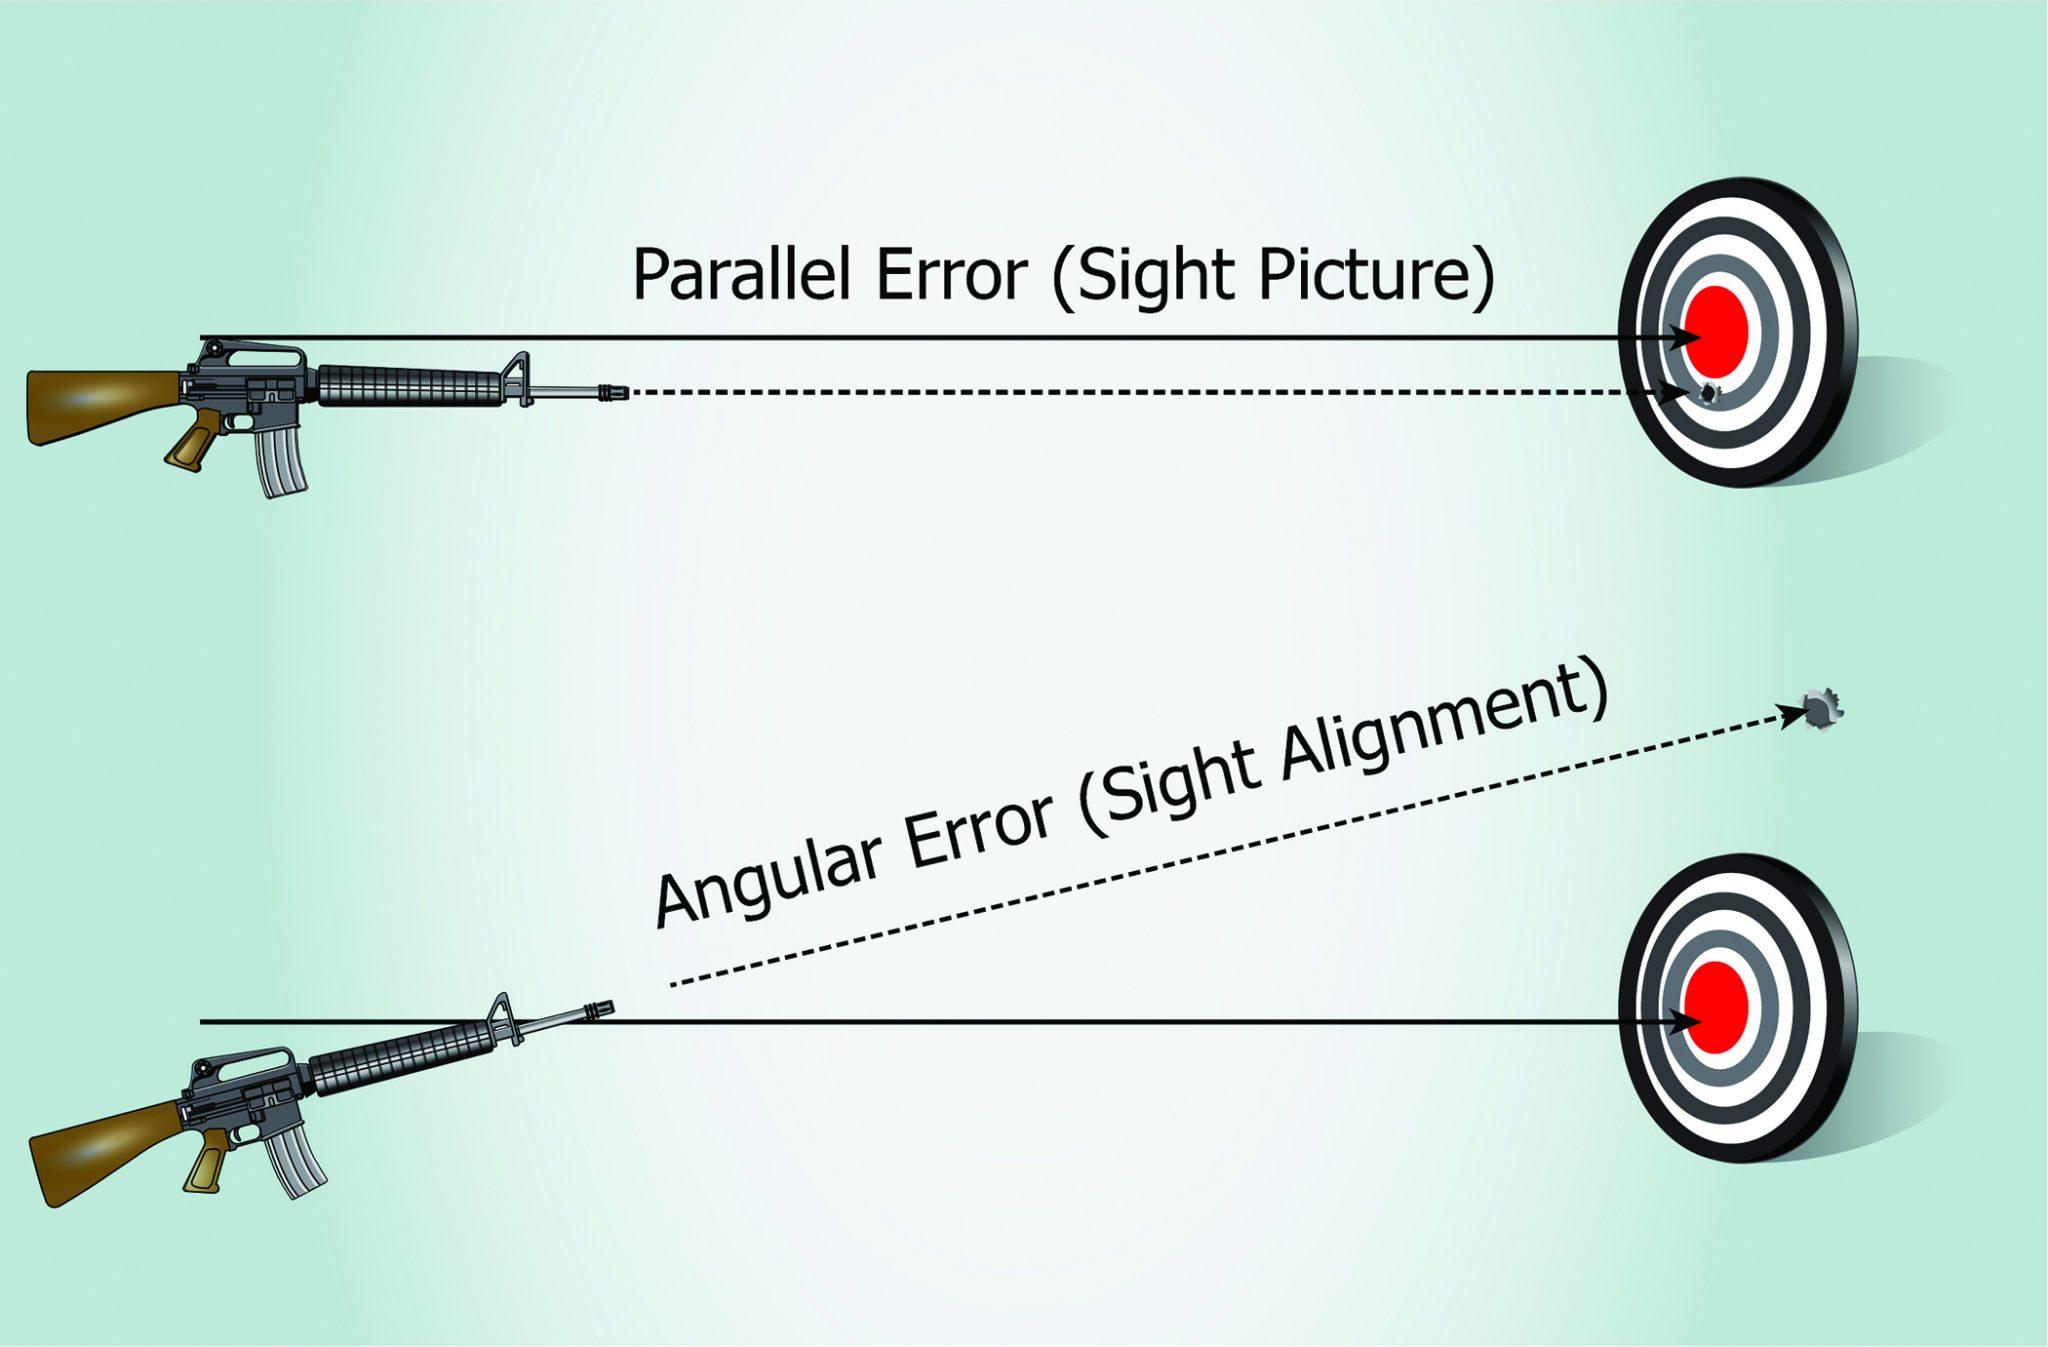 Angular and parallel shift erors